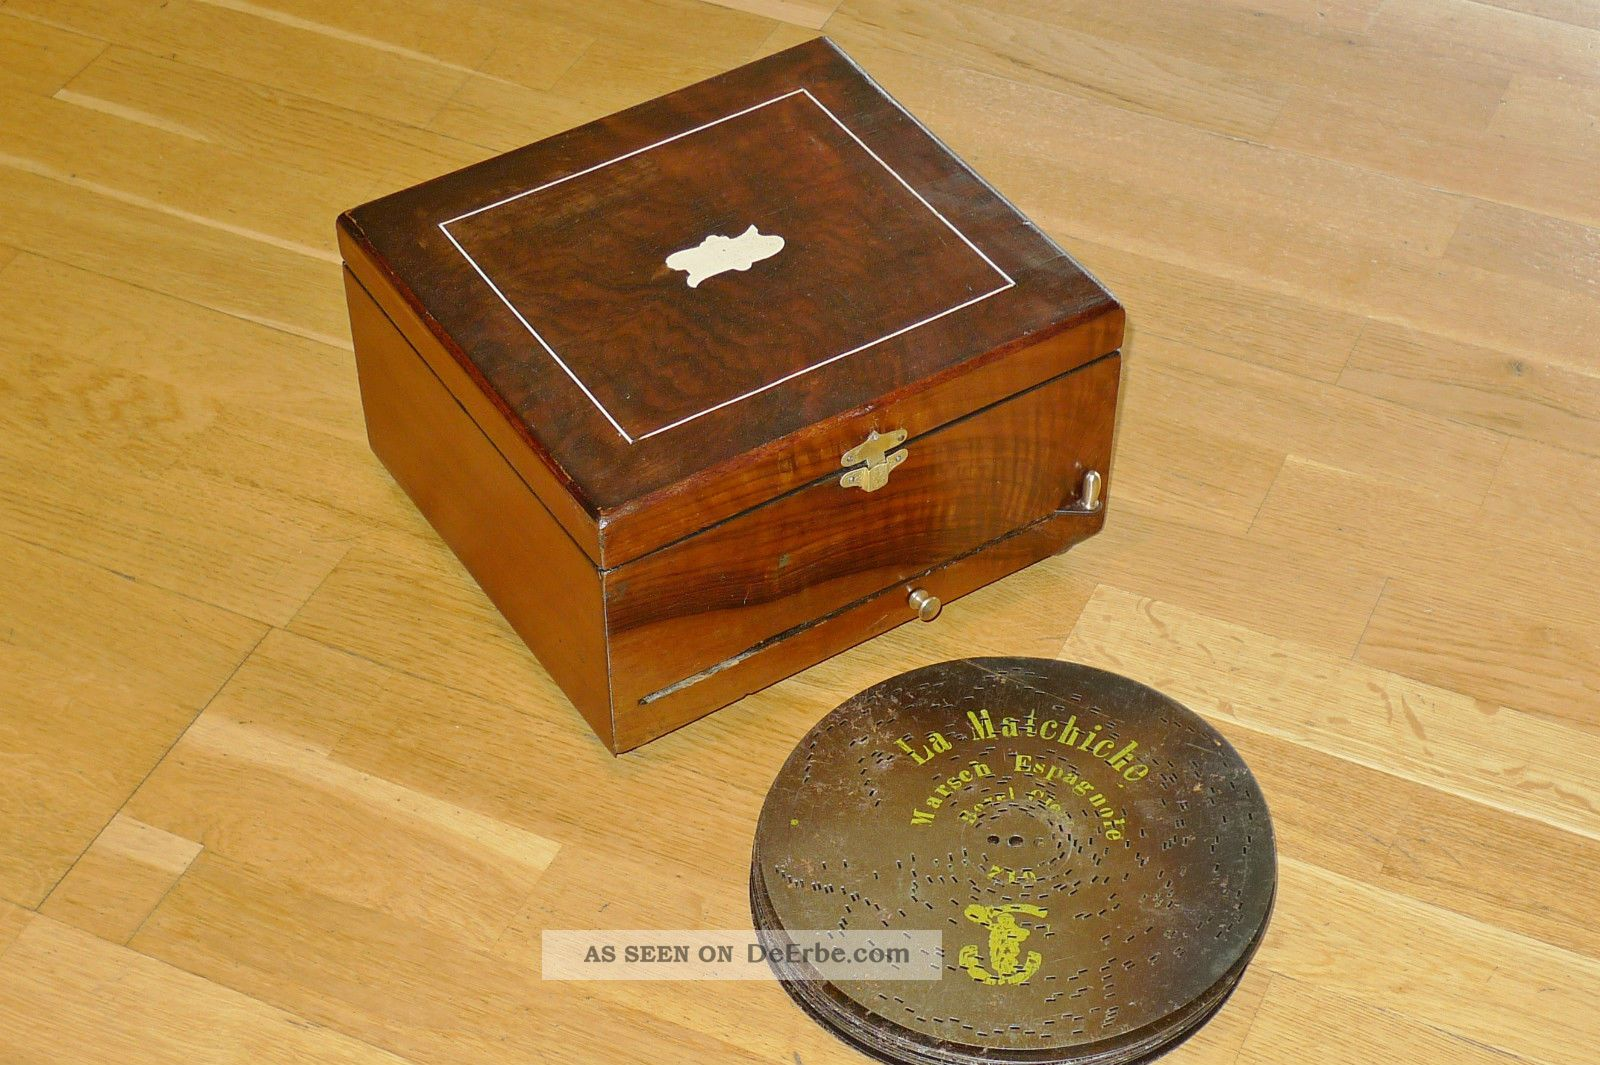 polyphon platten spieluhr um 1900 mit 12 stck 20 5 cm. Black Bedroom Furniture Sets. Home Design Ideas